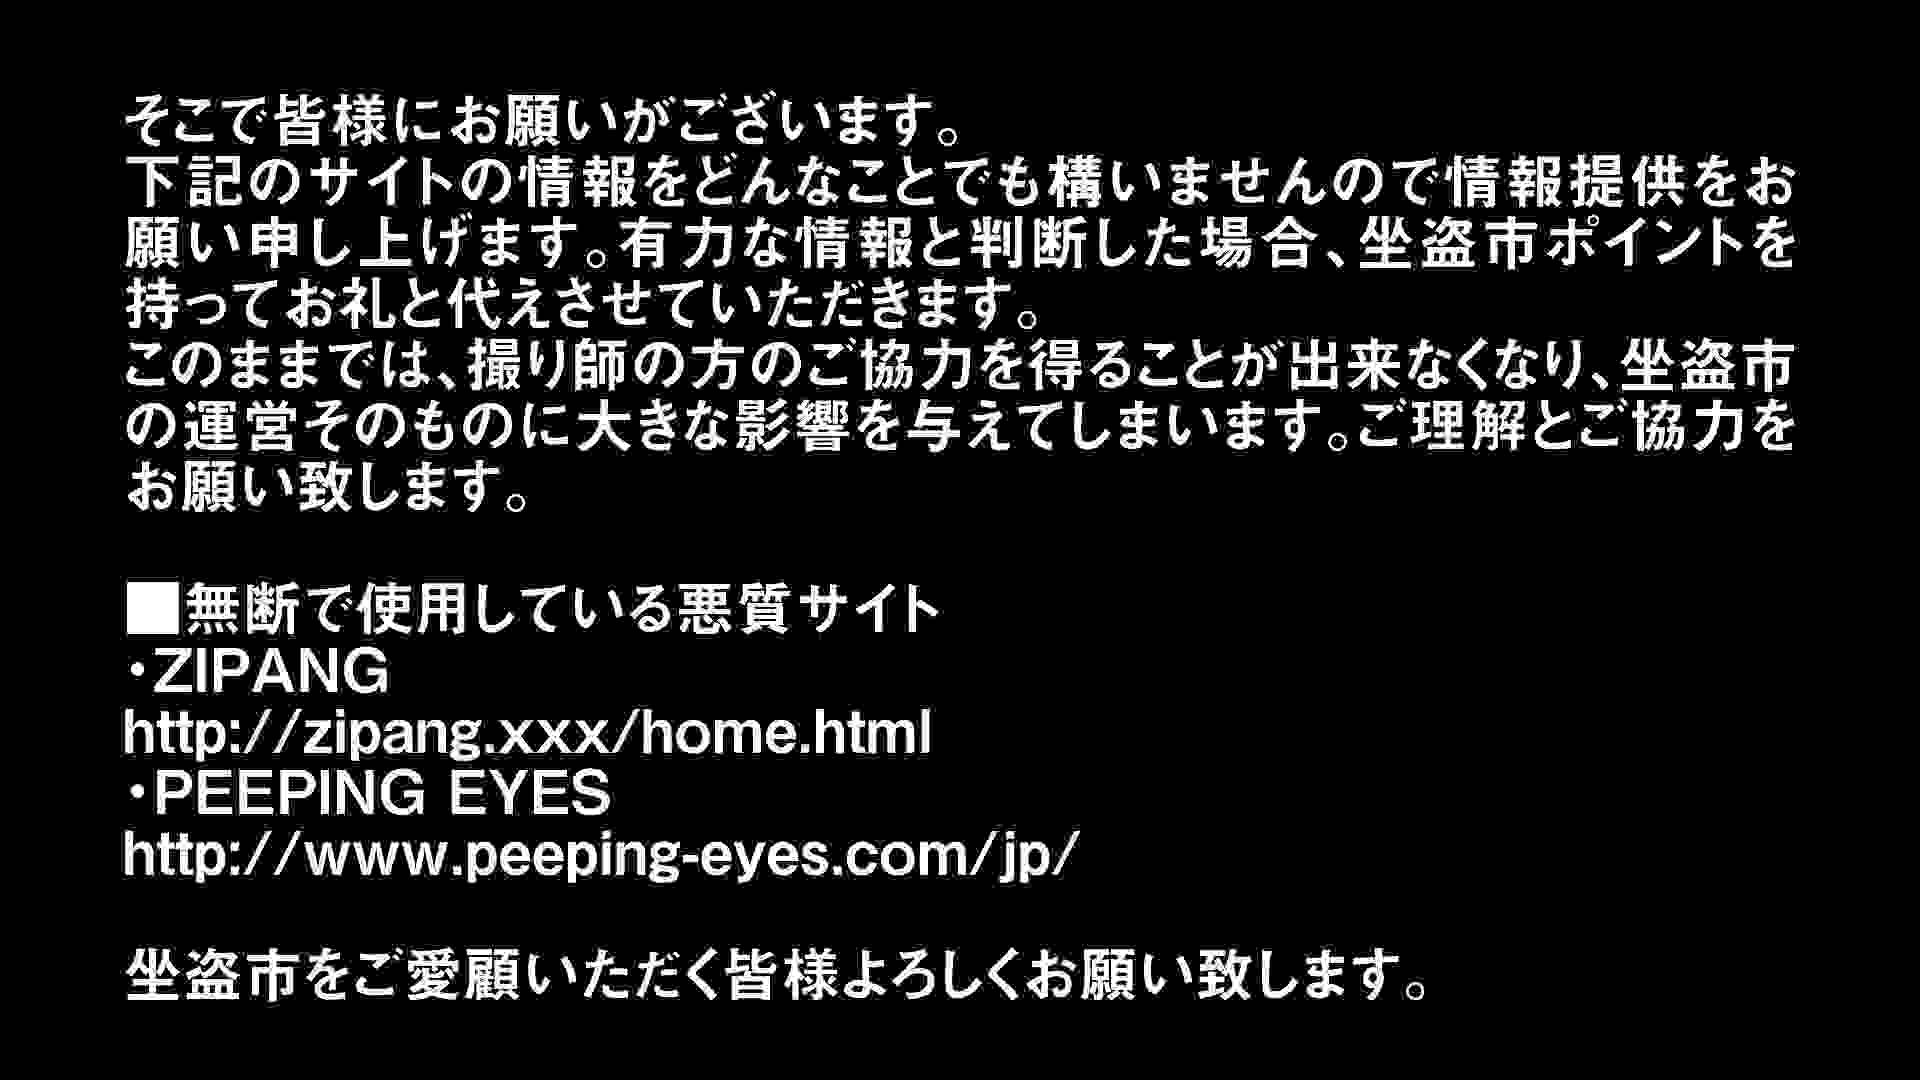 Aquaな露天風呂Vol.296 盗撮シリーズ   露天風呂編  102PIX 43